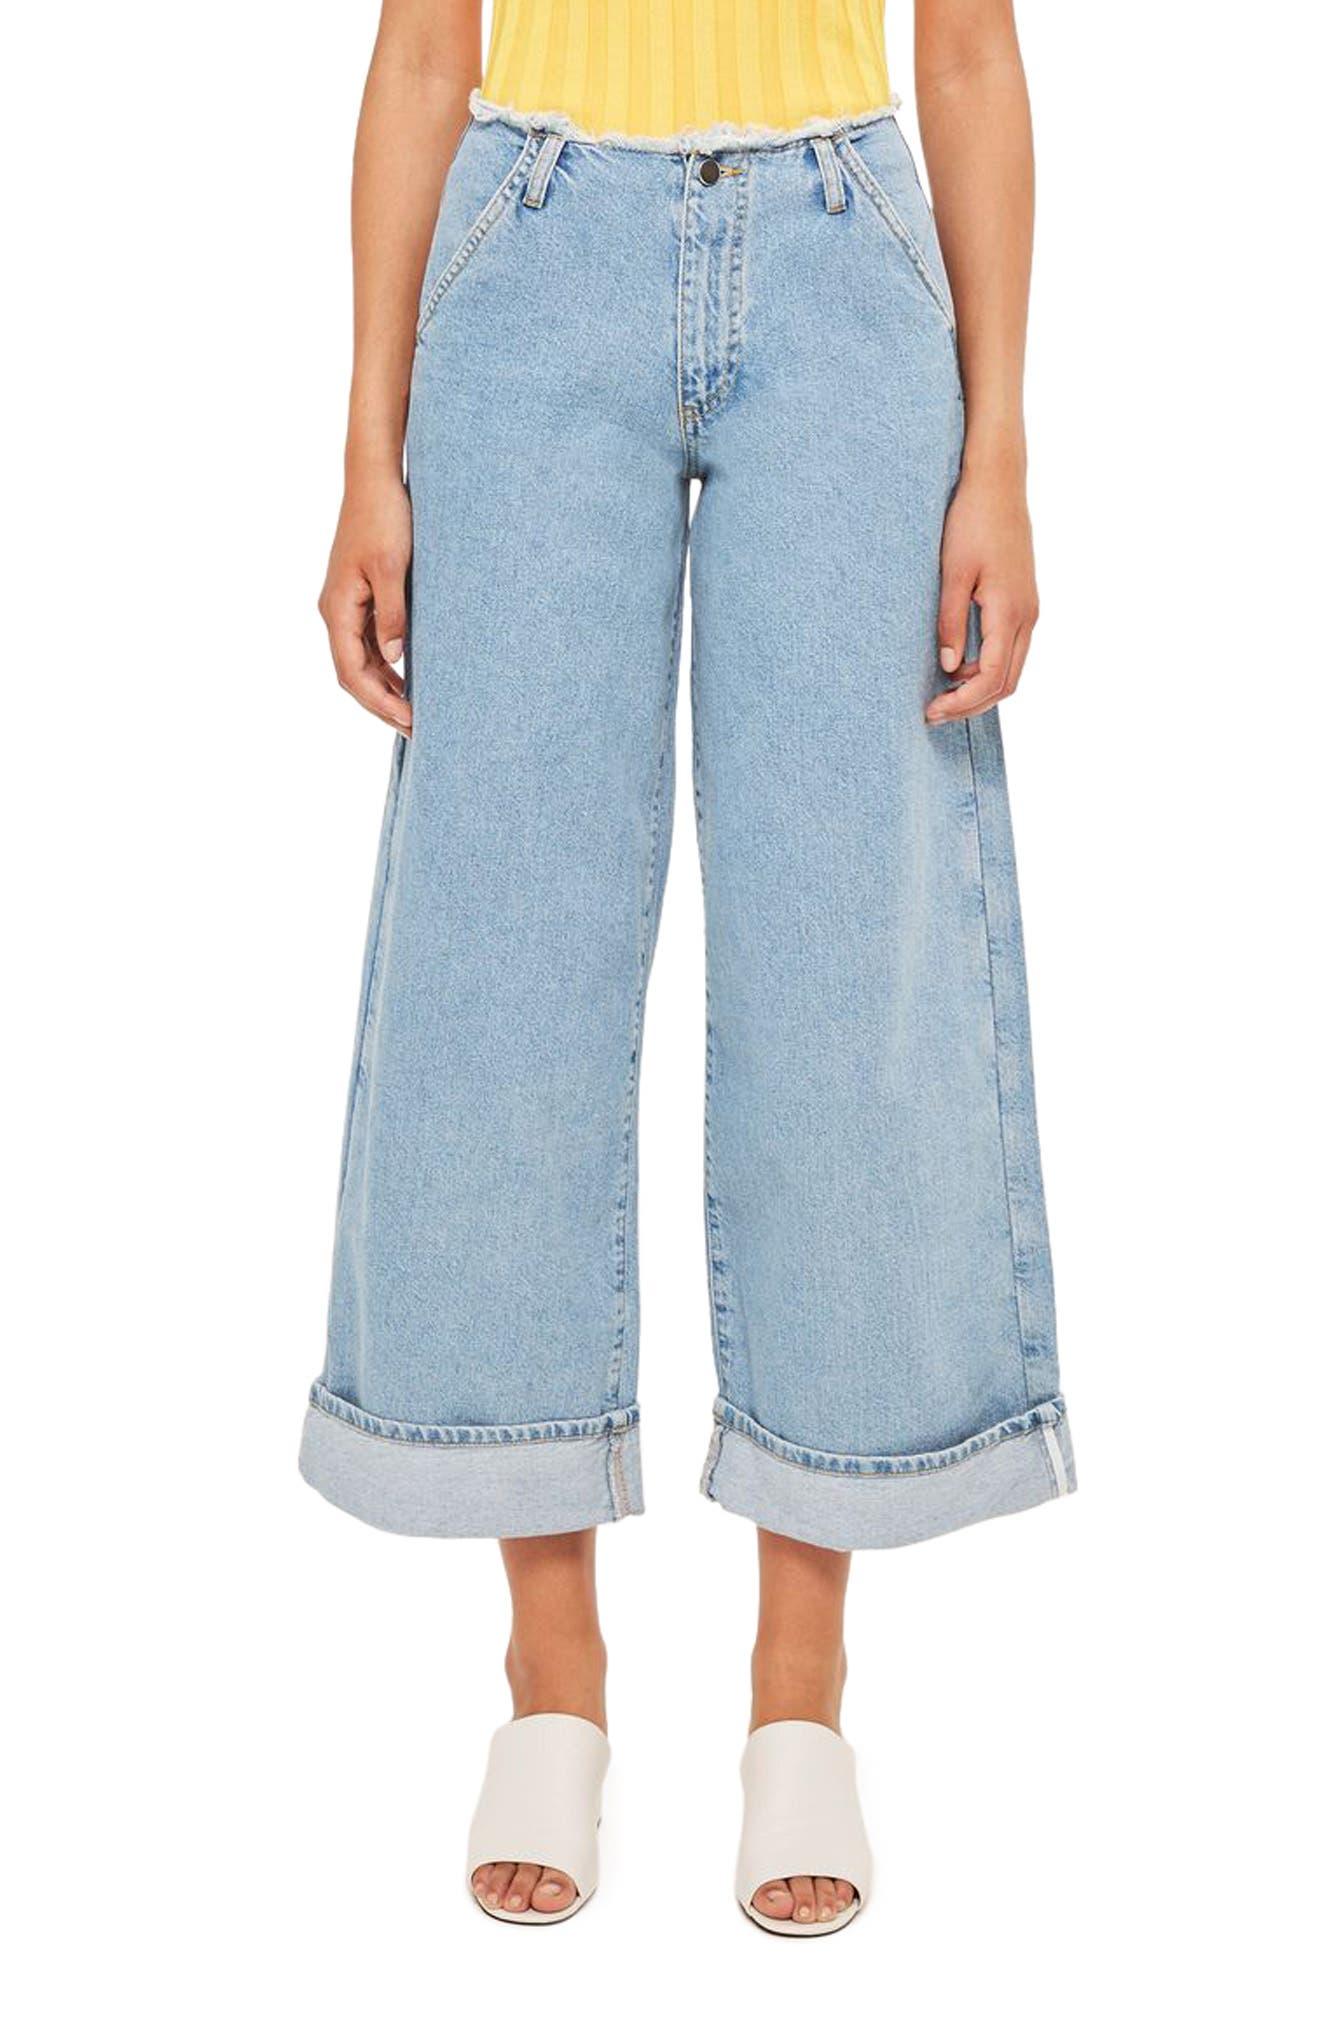 Alternate Image 1 Selected - Topshop Boutique Frayed Waist Super Wide Leg Jeans